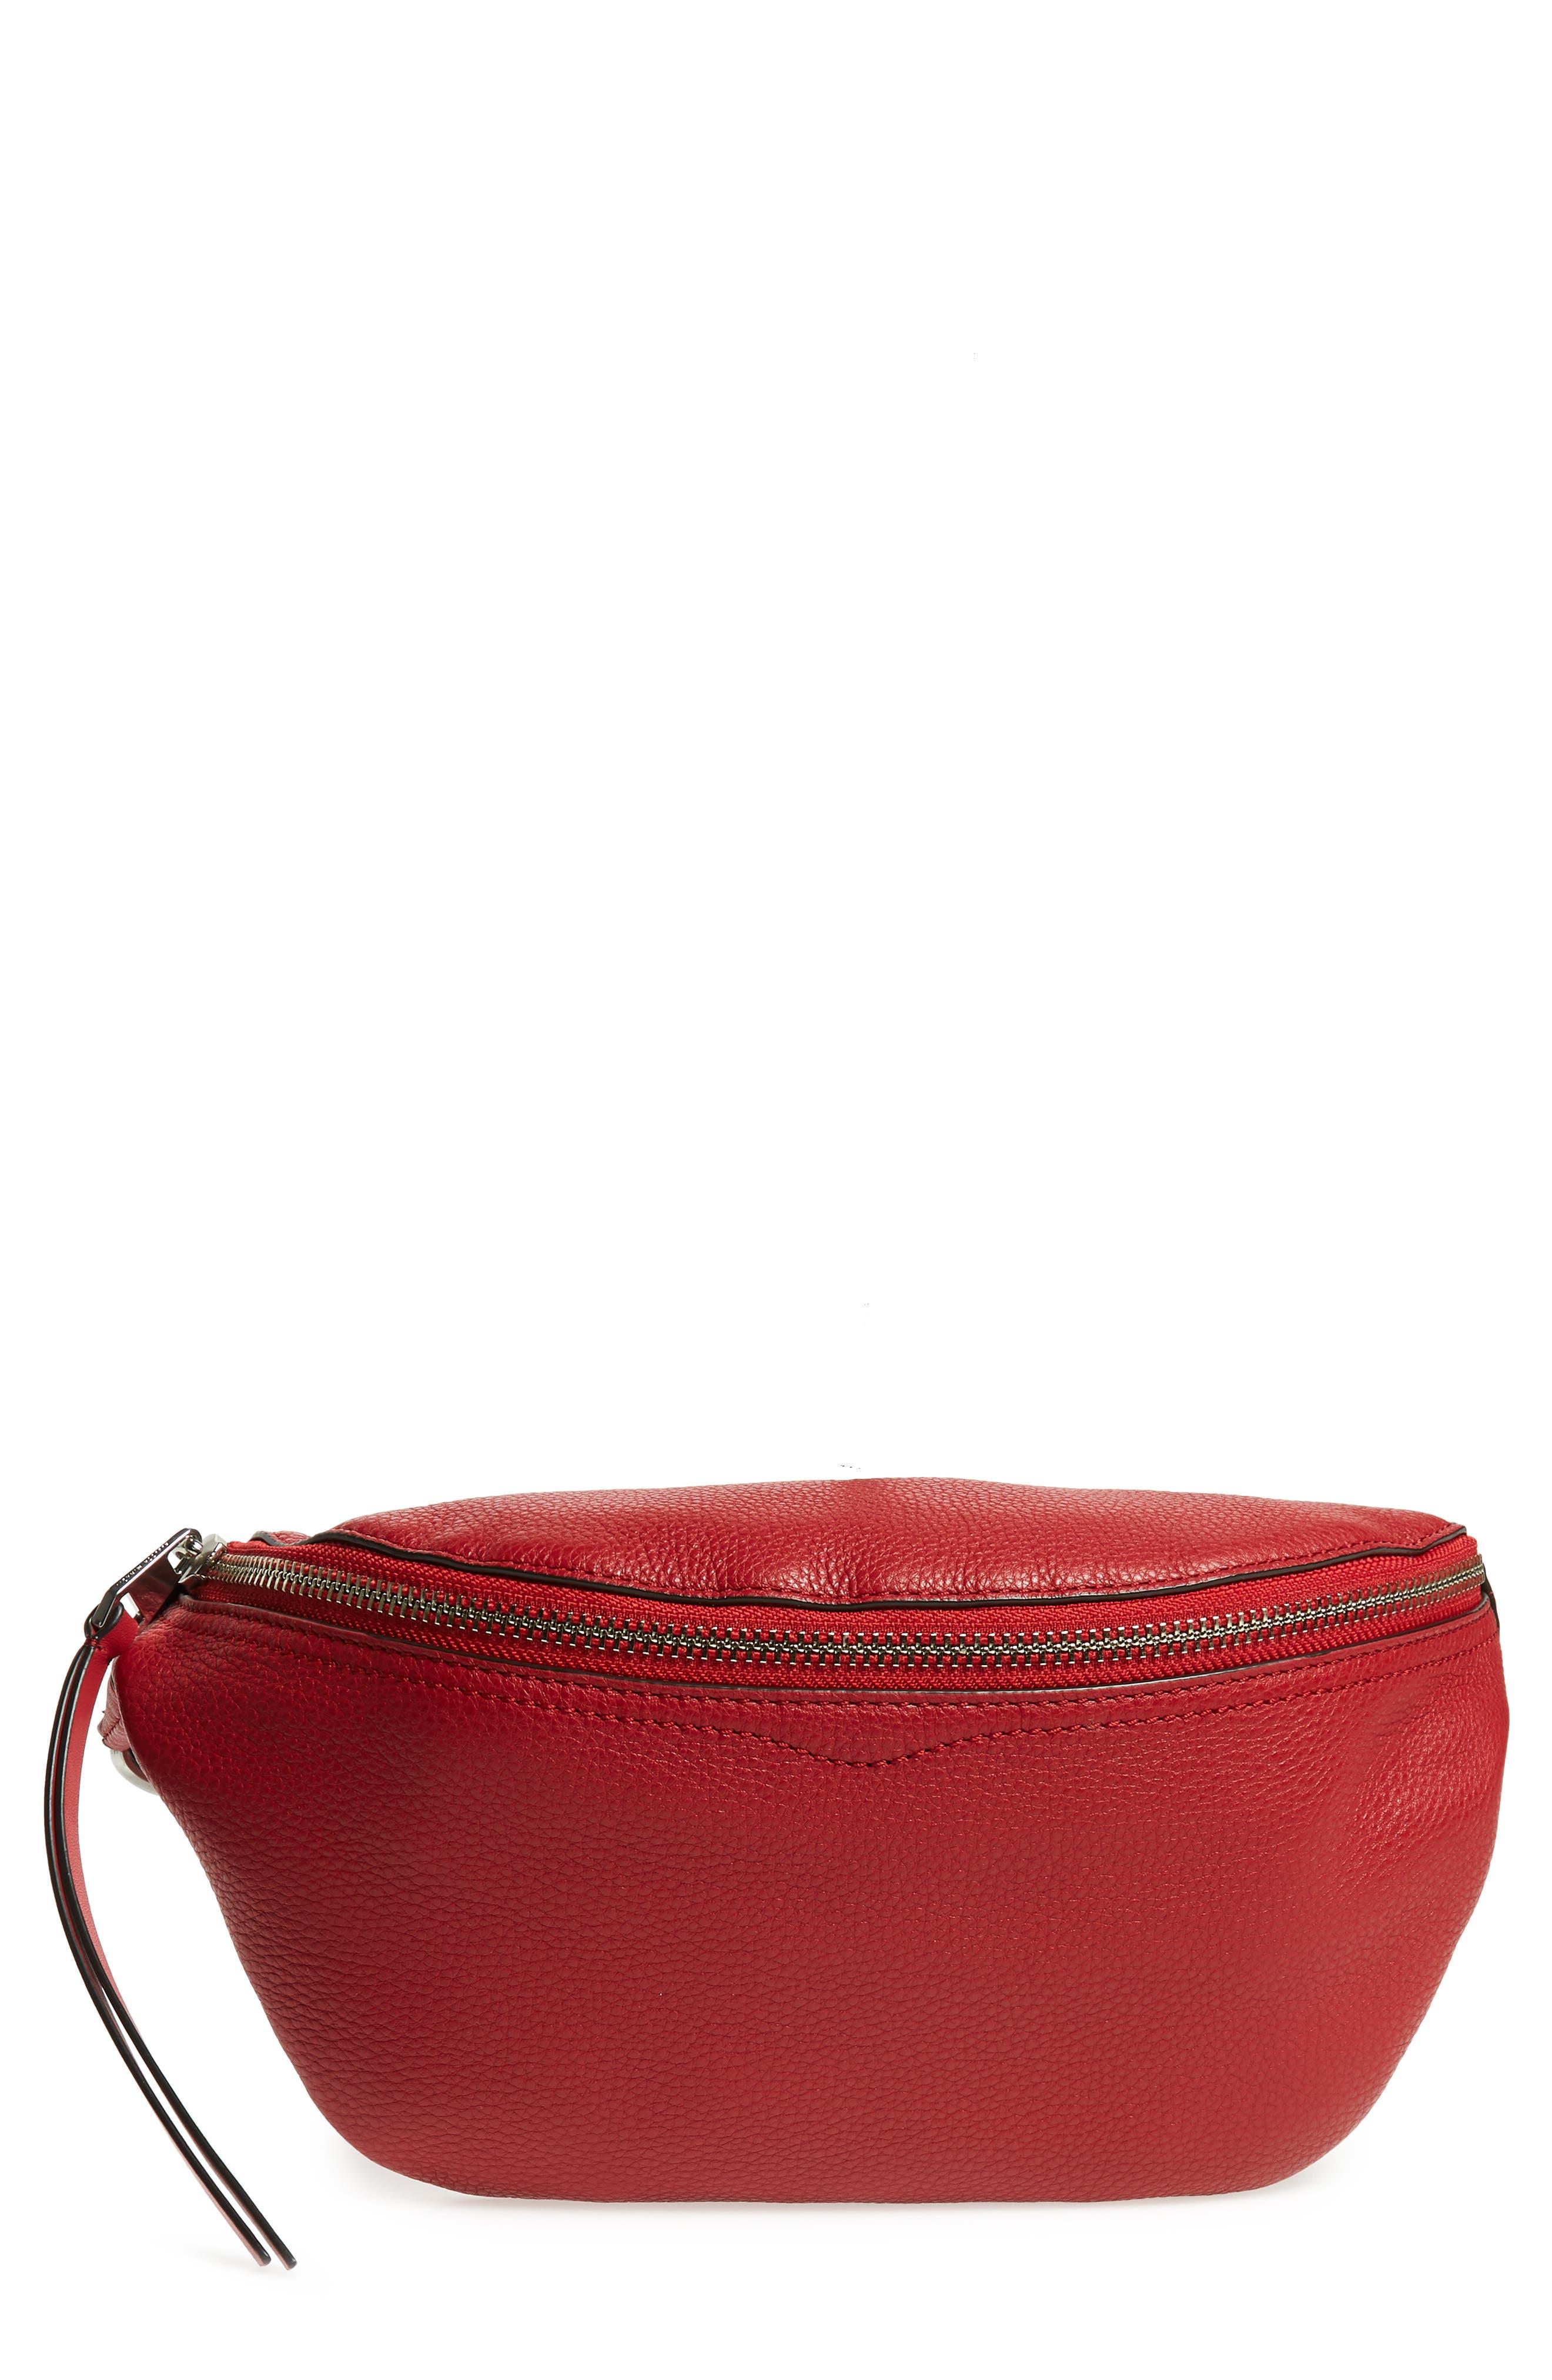 Bree Leather Belt Bag,                             Main thumbnail 1, color,                             SCARLET